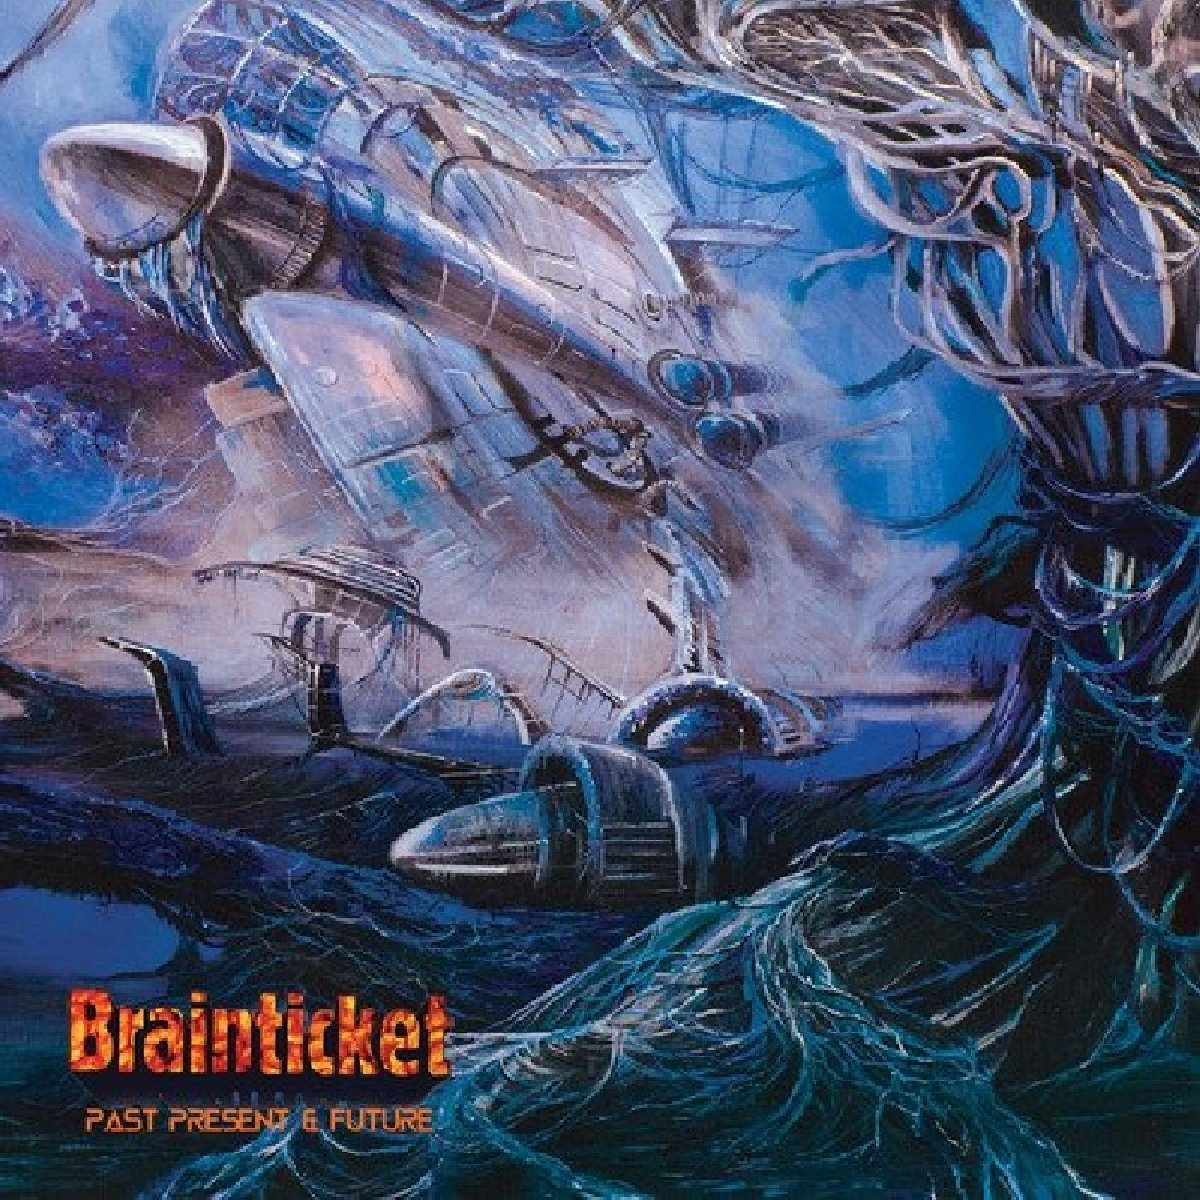 Vinilo : Brainticket - Past Present & Future (180 Gram Vinyl, Gatefold LP Jacket)